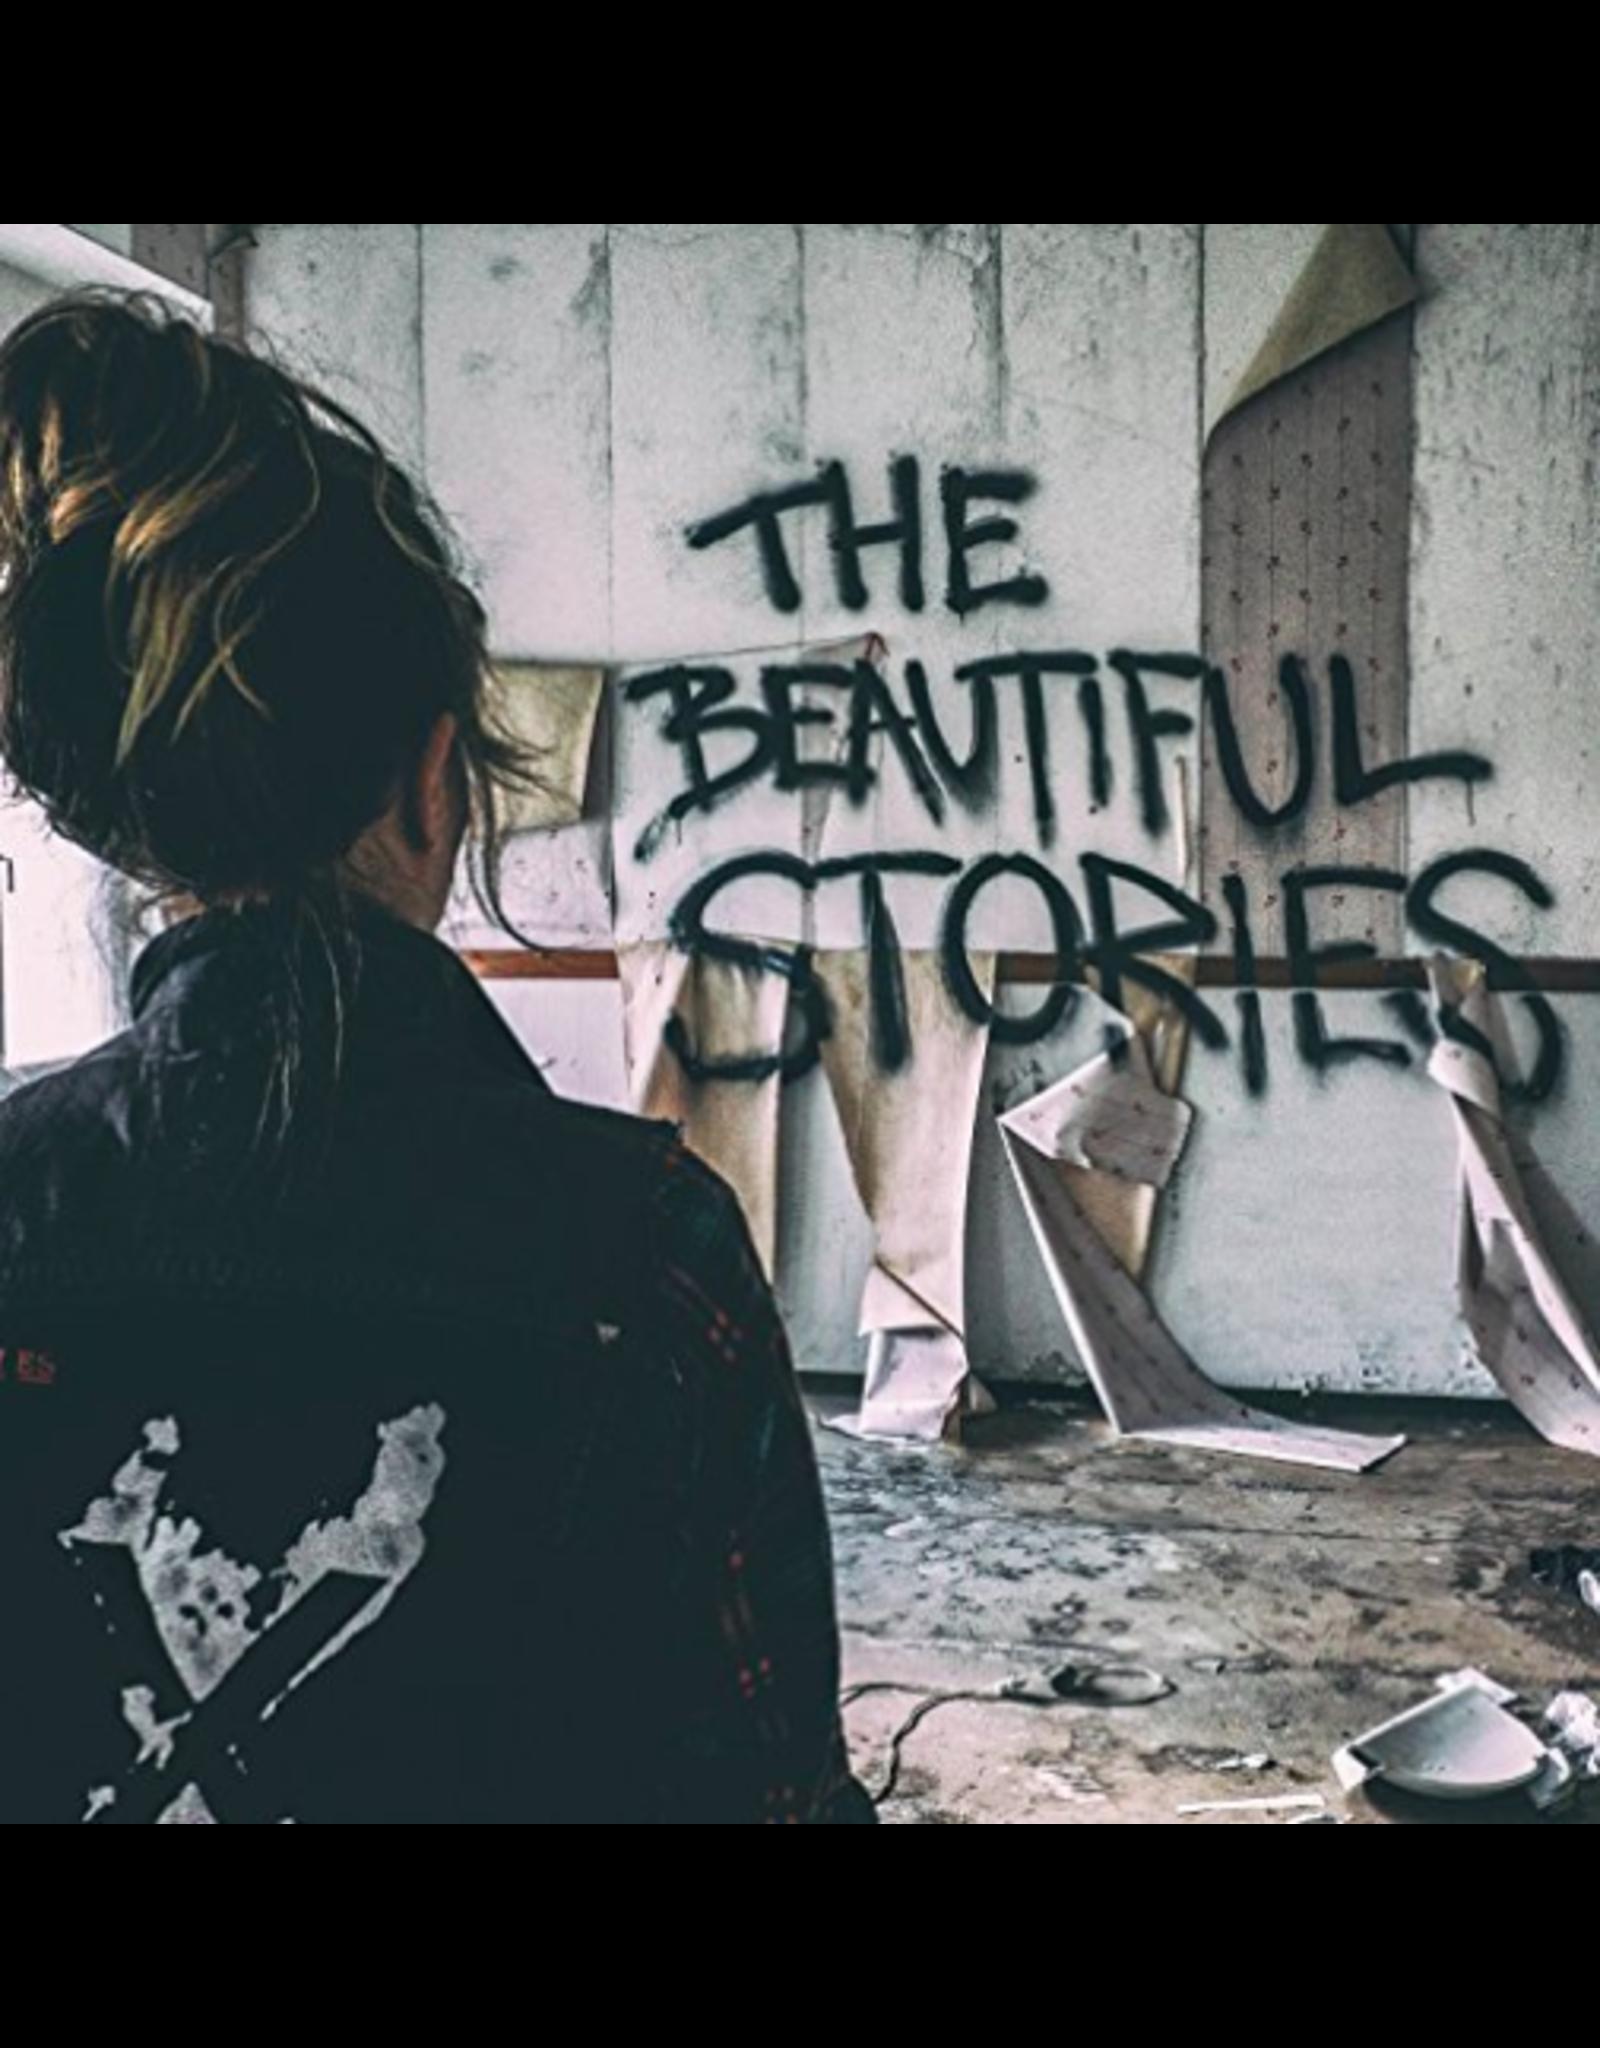 INVSN - The Beautiful Stories LP